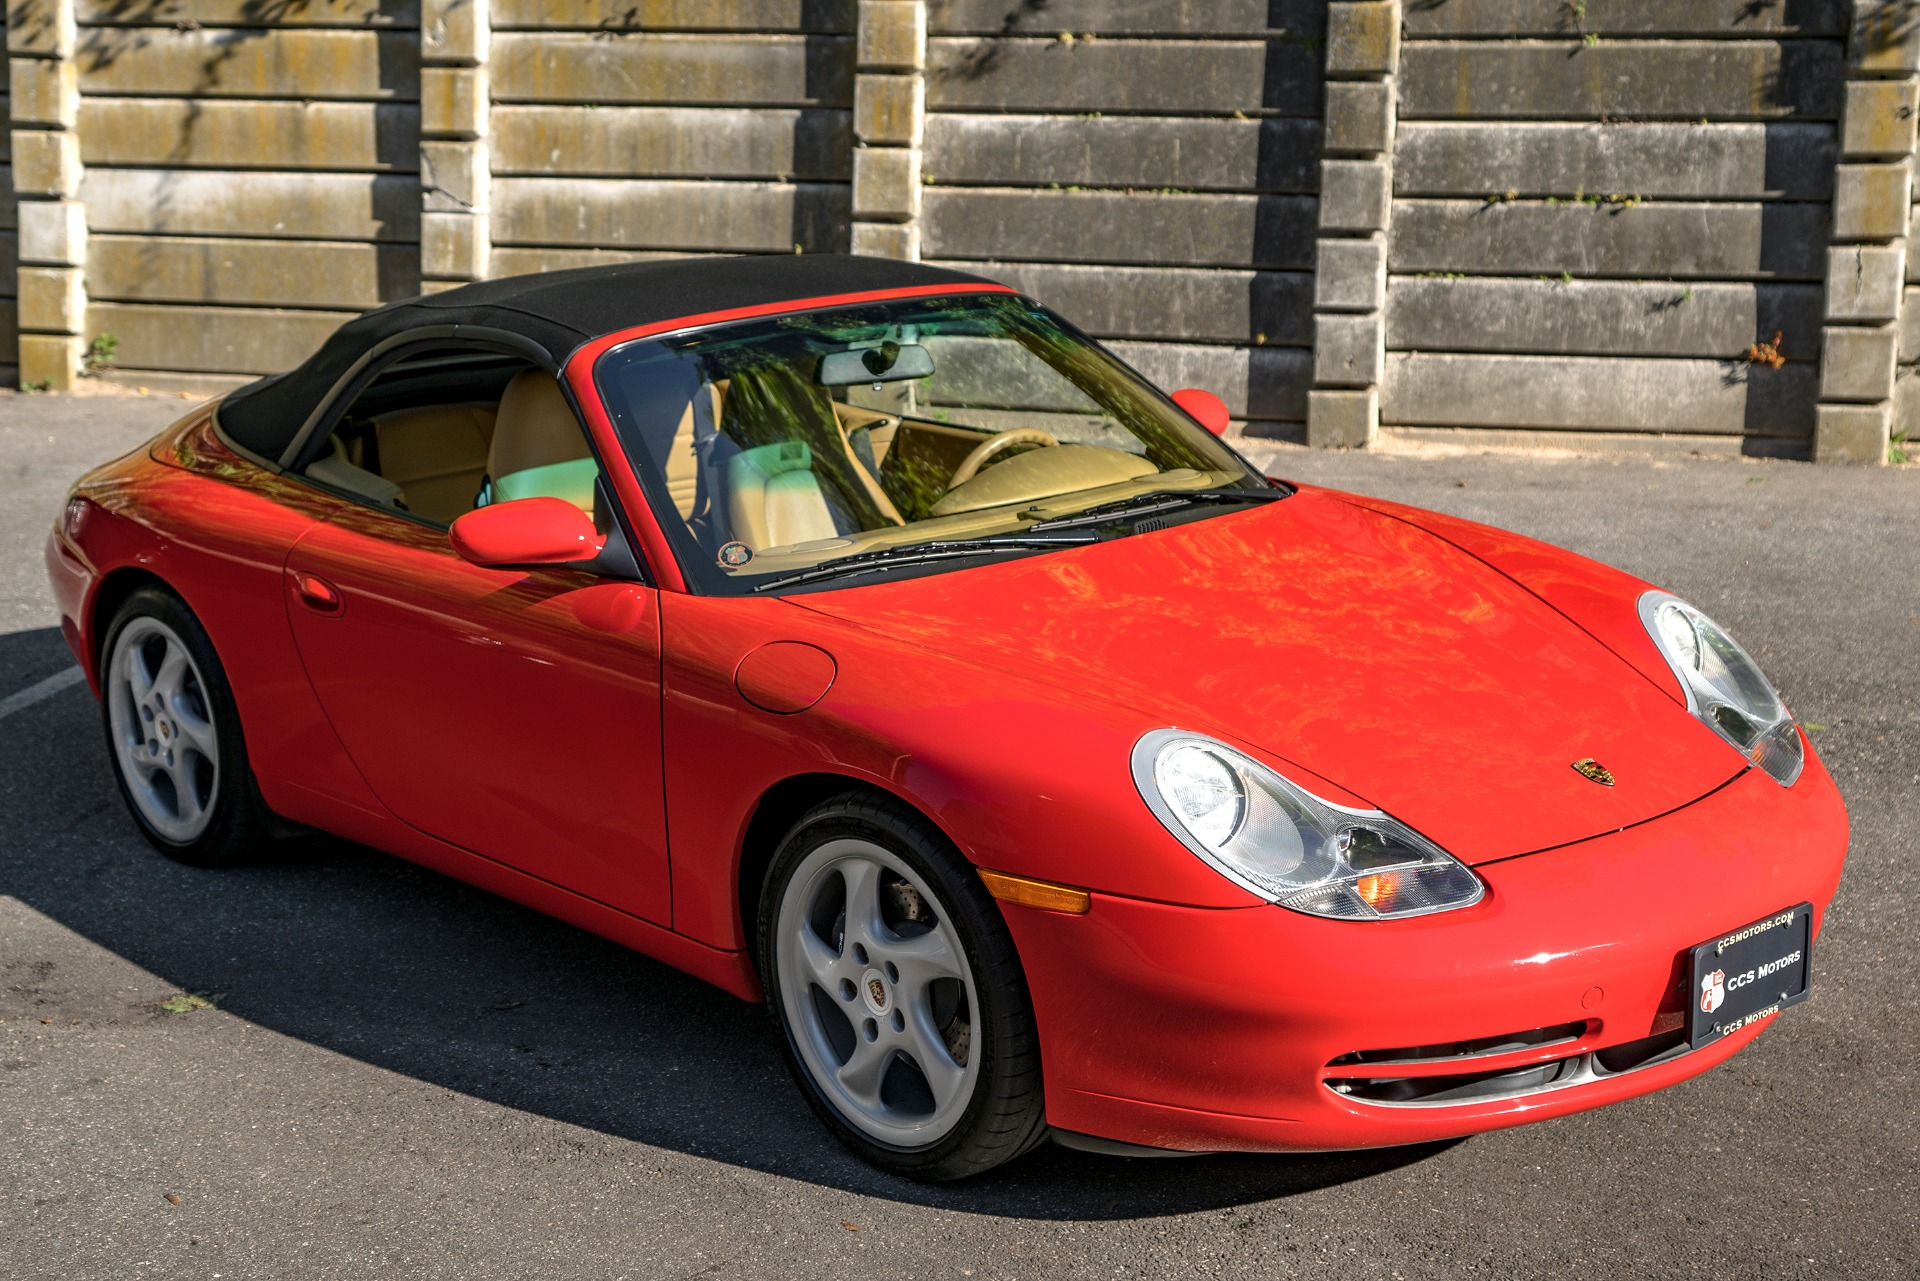 2000 Porsche 911 Carrera Cabriolet Stock 1449 For Sale